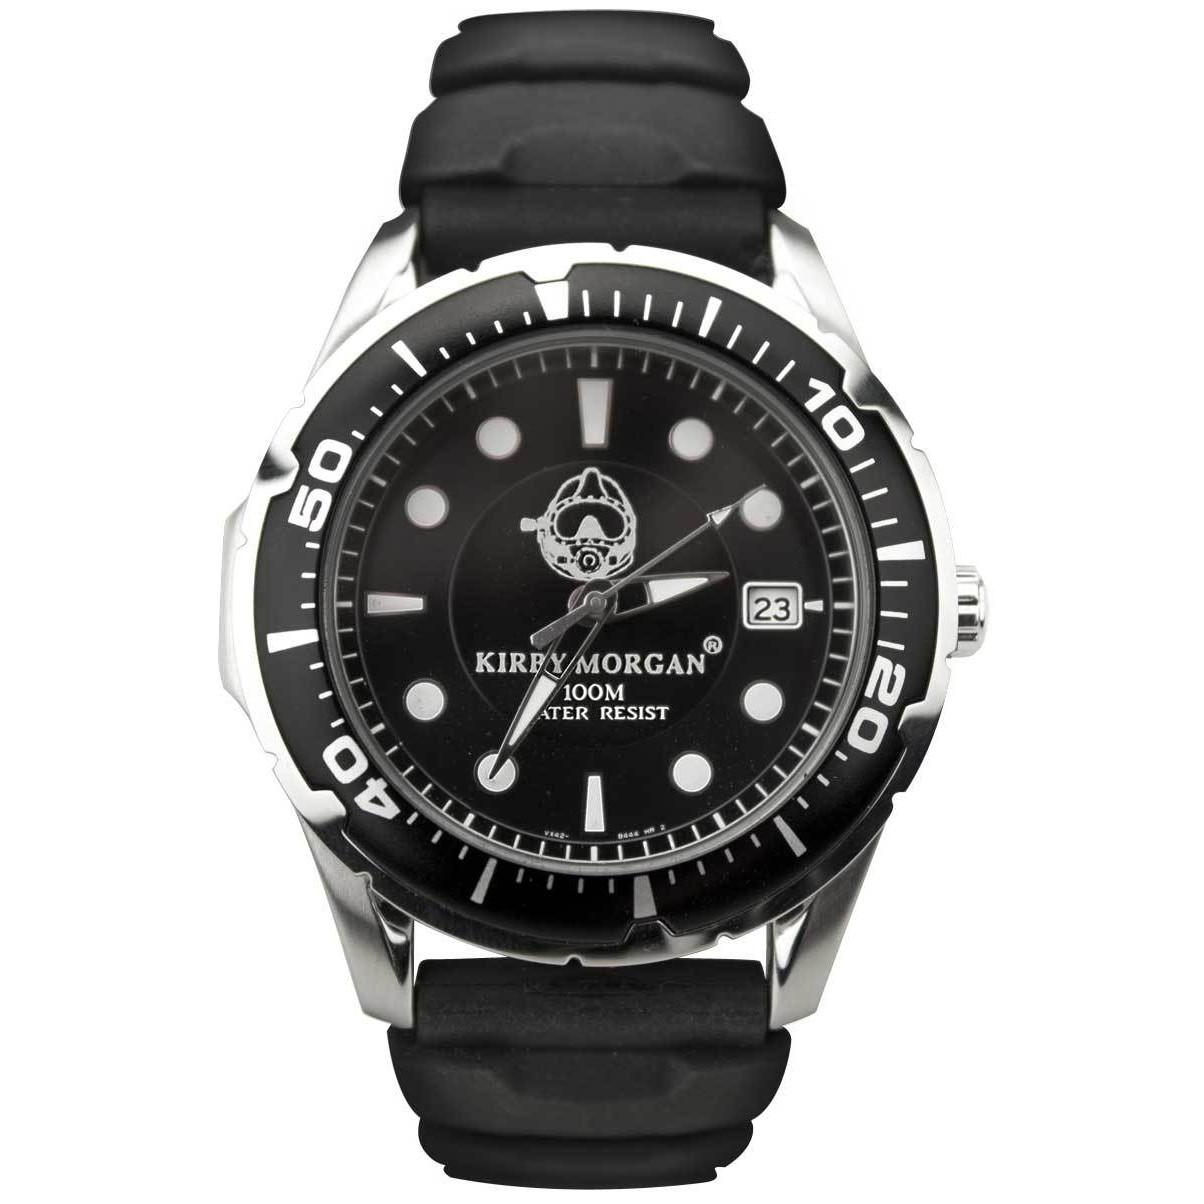 online store 17711 8a96c Kirby Morgan Watch